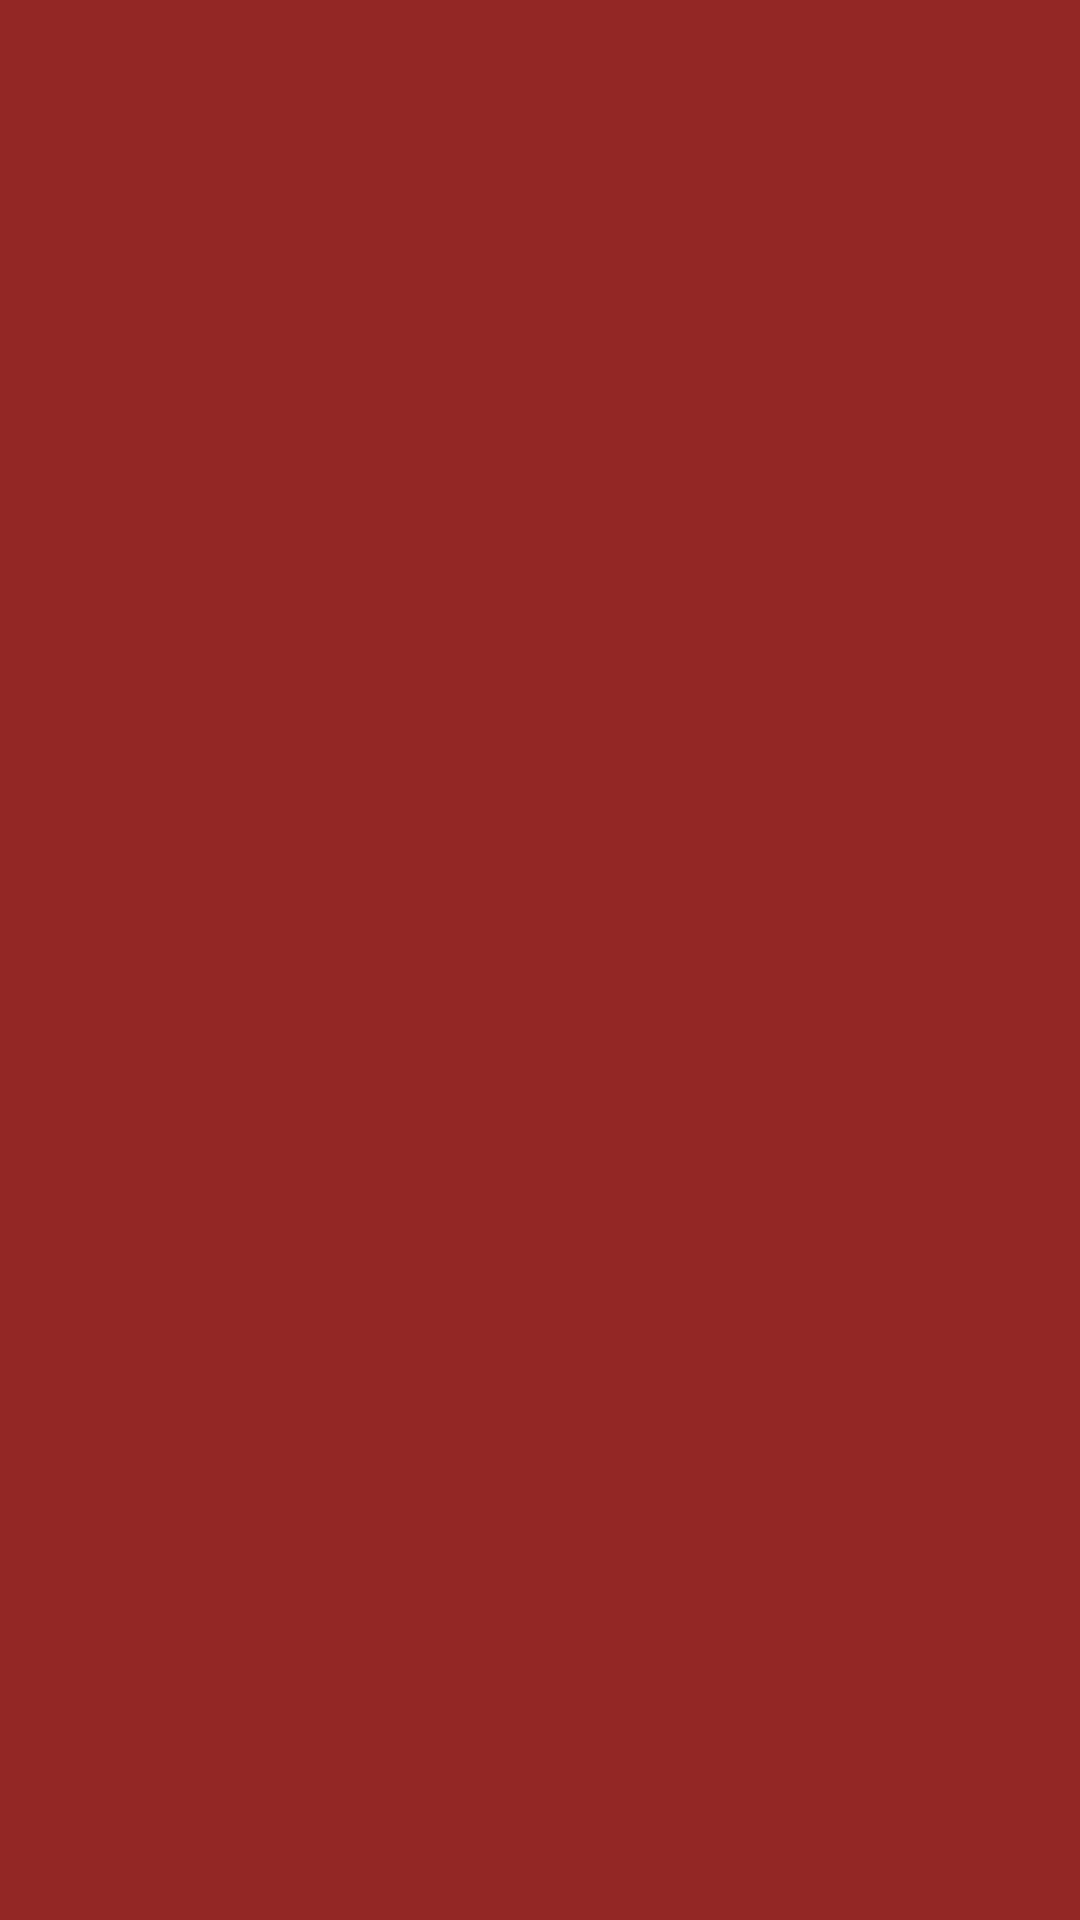 1080x1920 Vivid Auburn Solid Color Background